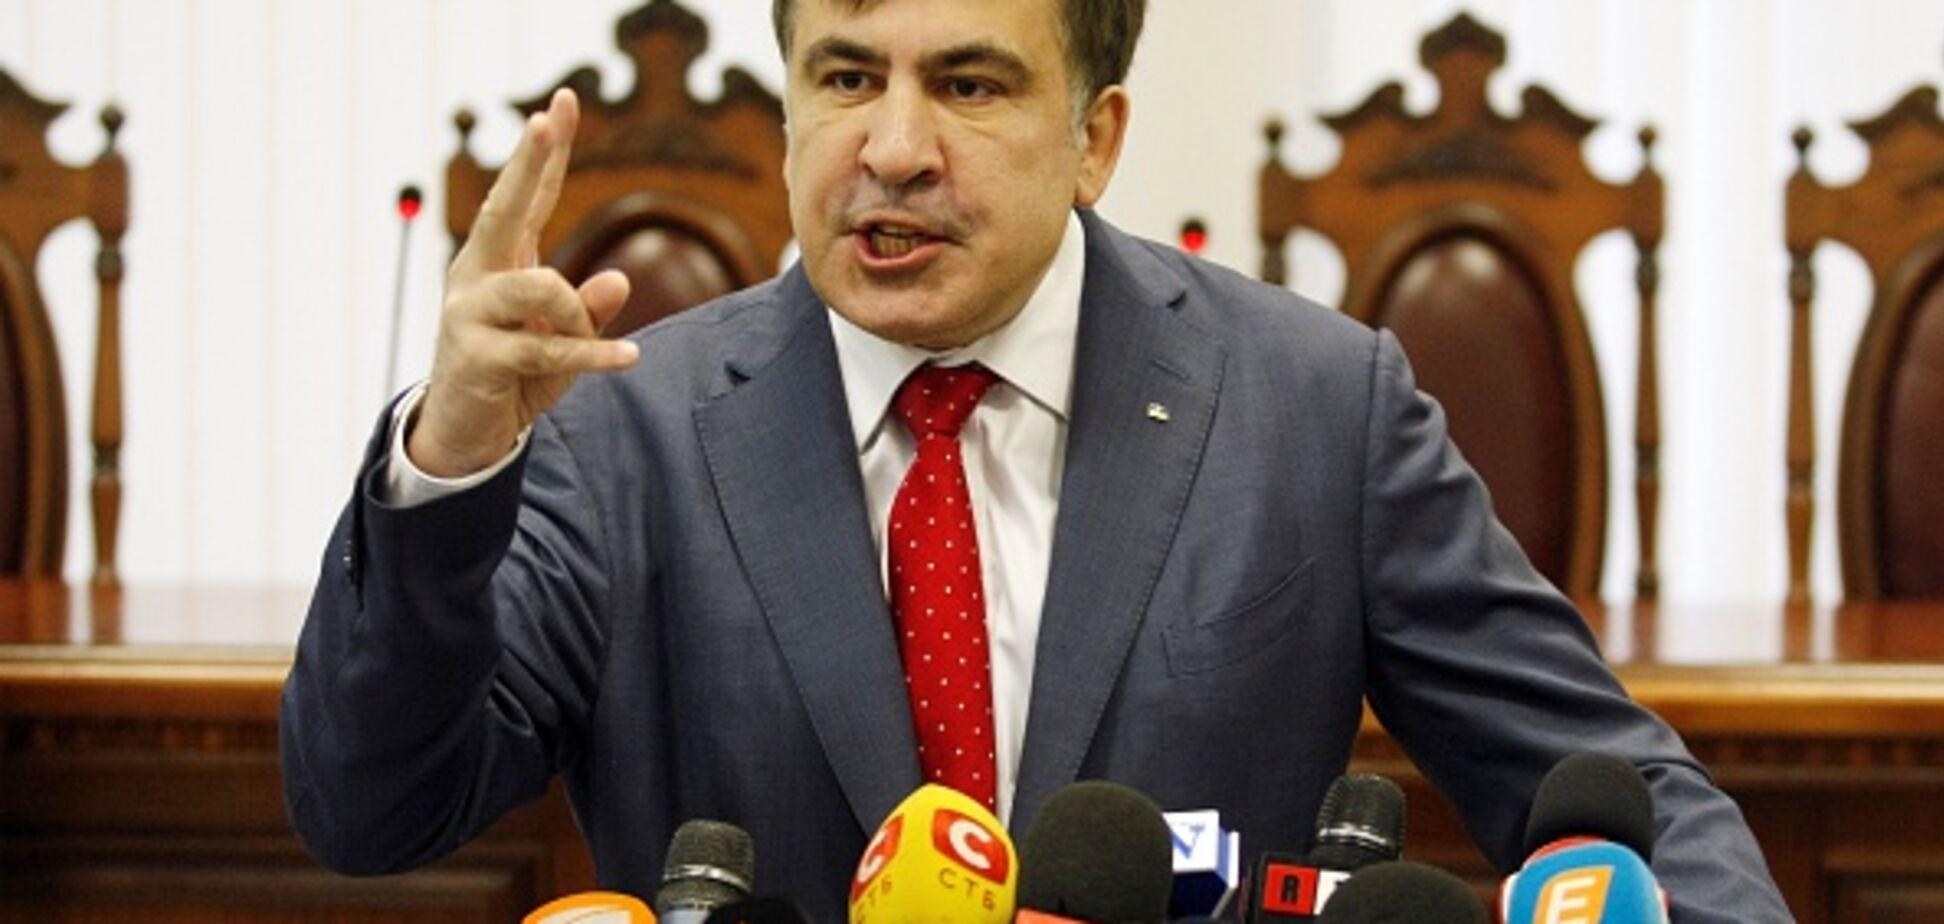 'Побойся Бога!' Саакашвили поймали на лжи по обмену пленными